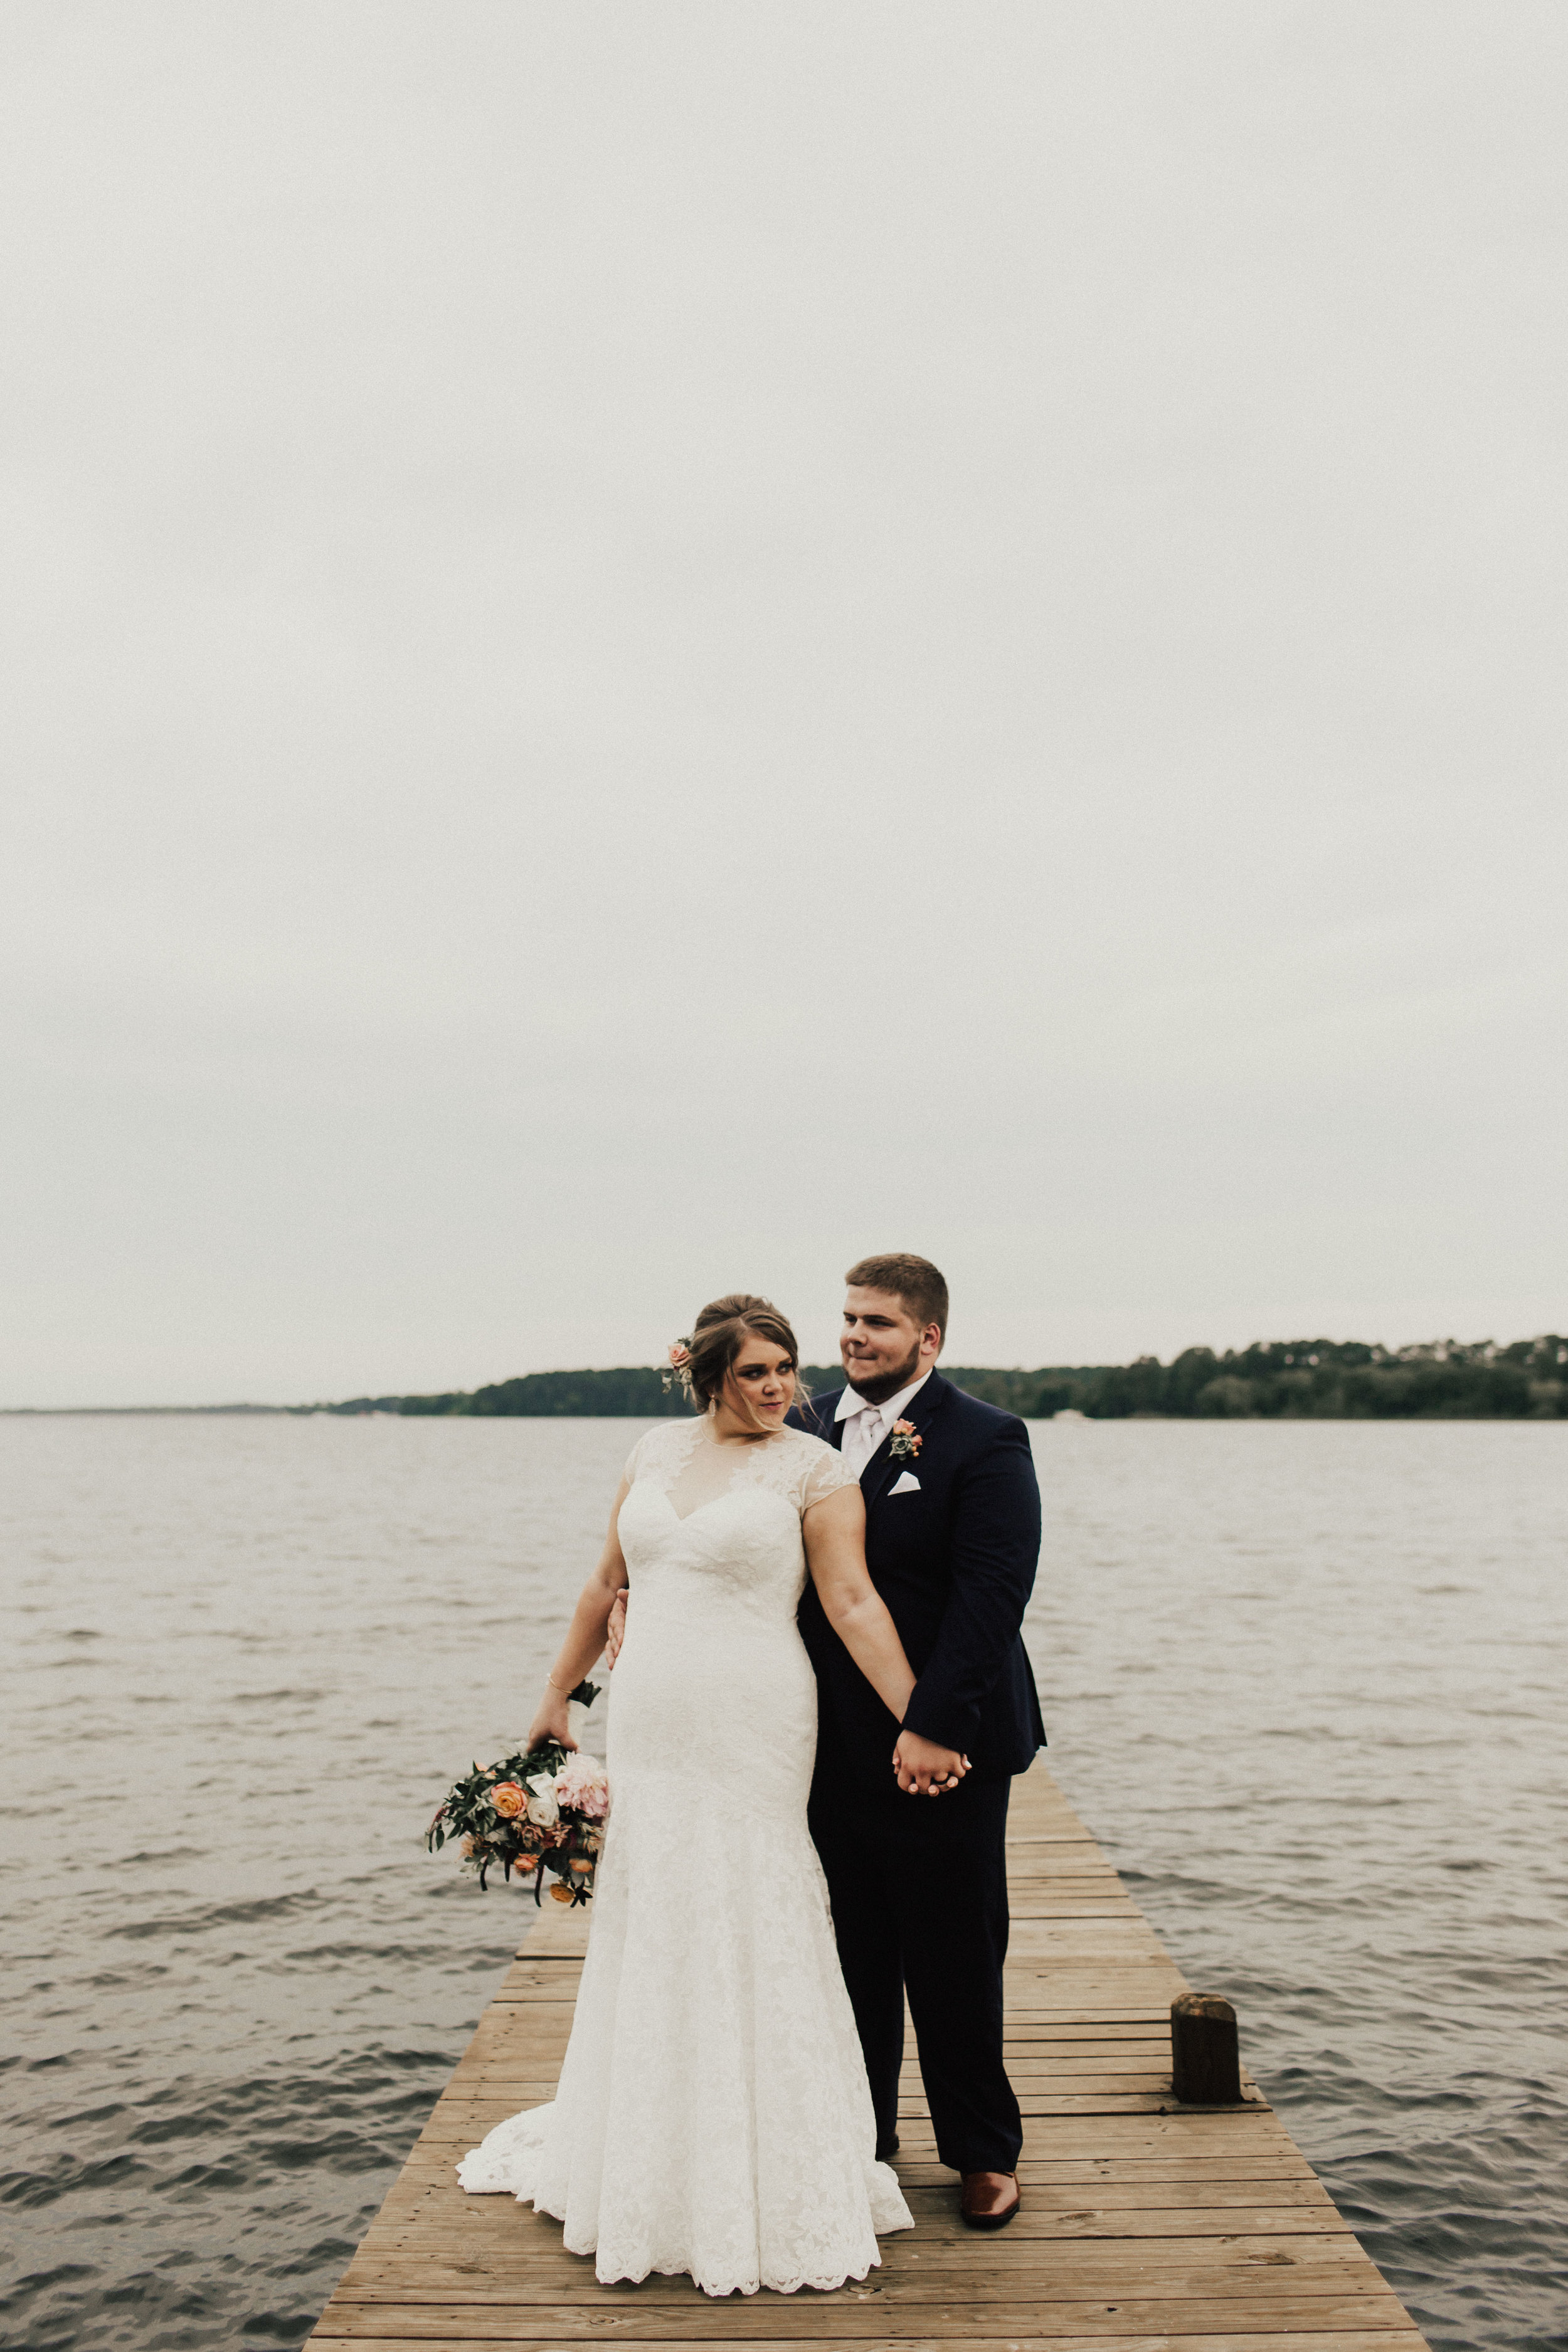 caitlin-jackson-wedding-photographer-lake-tyler-petroleum-club-texas--582.jpg